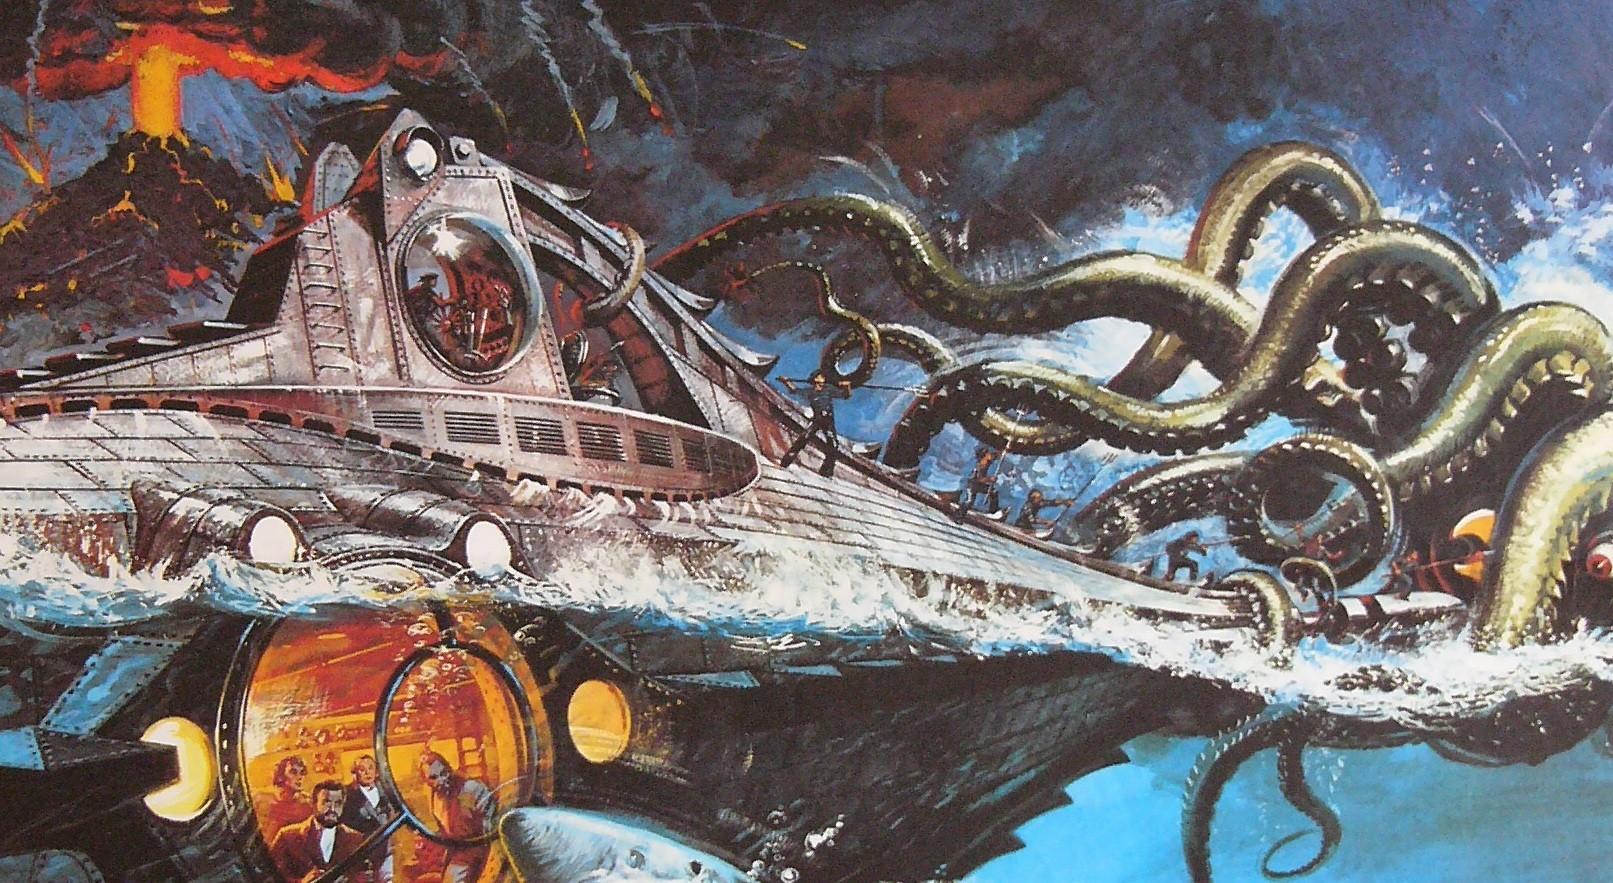 david-fincher-discusses-his-20000-leagues-under-the-sea